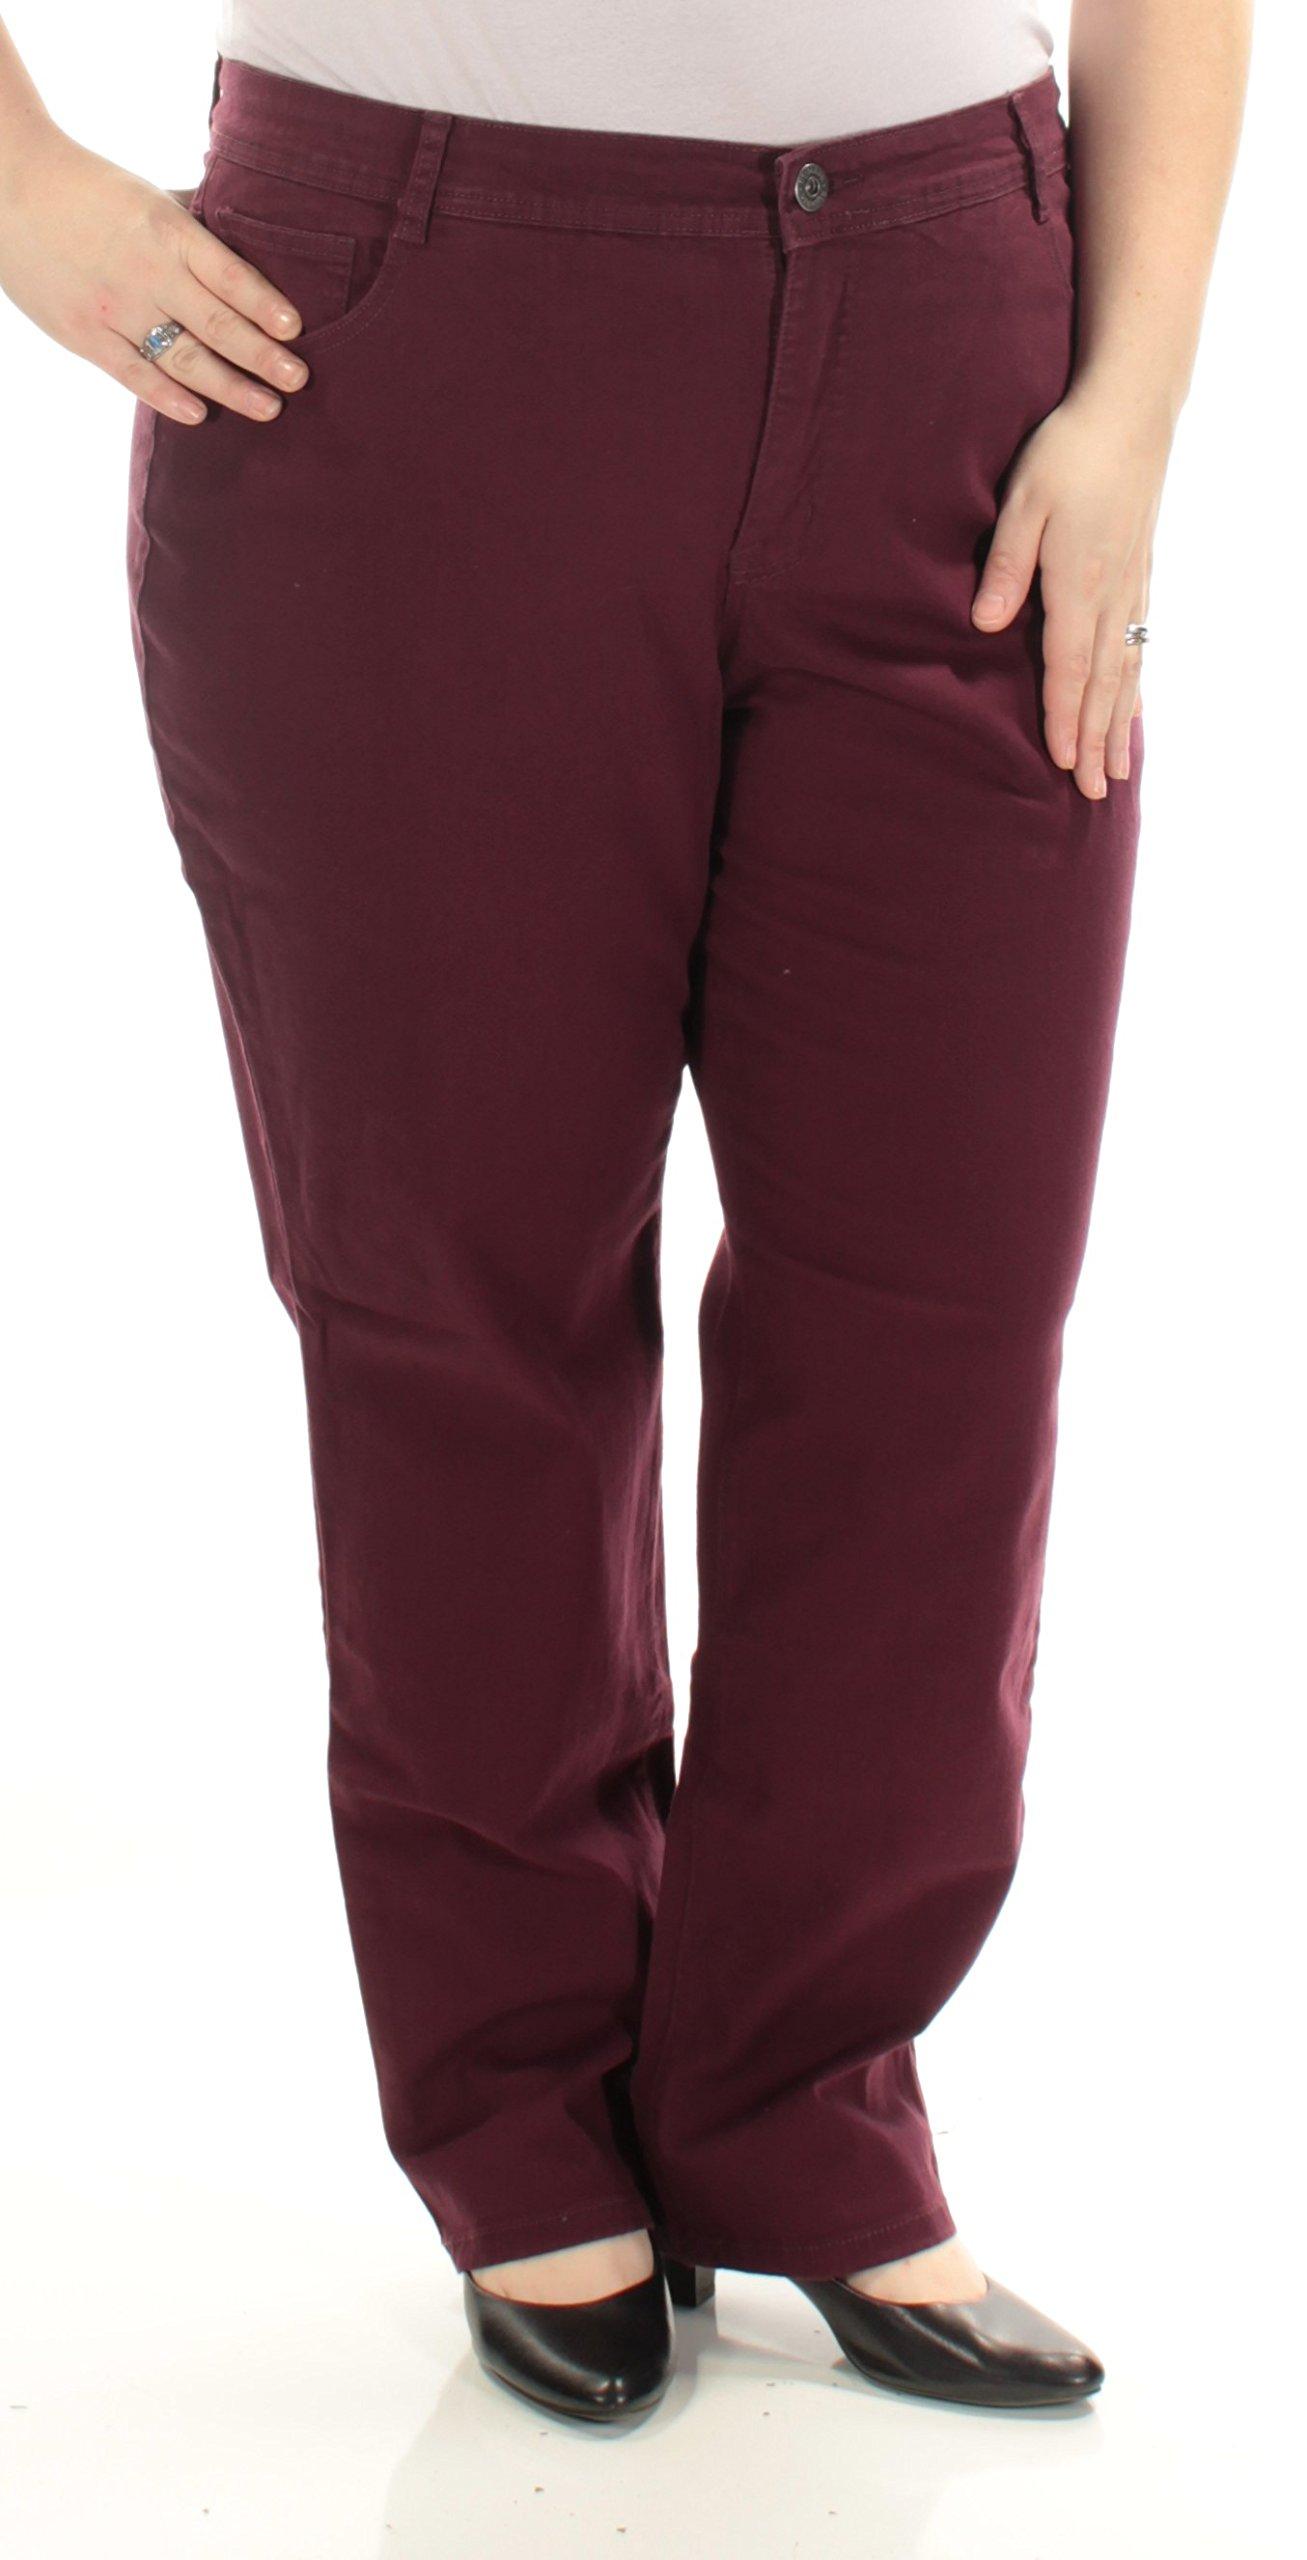 Style & Co. Womens Plus Tummy Control High Rise Slim Leg Jeans Purple 22W